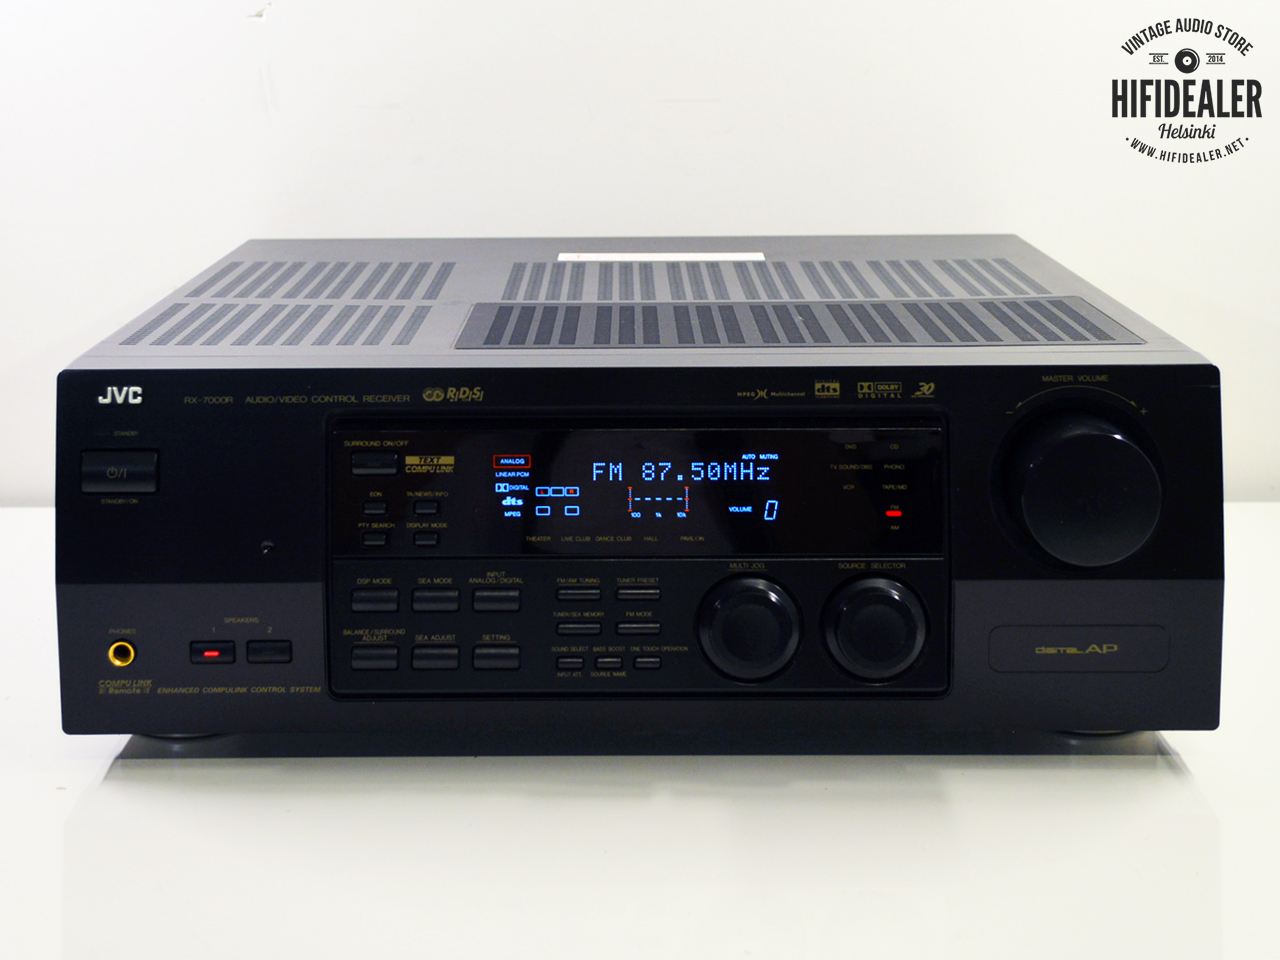 jvc-rx-7000r